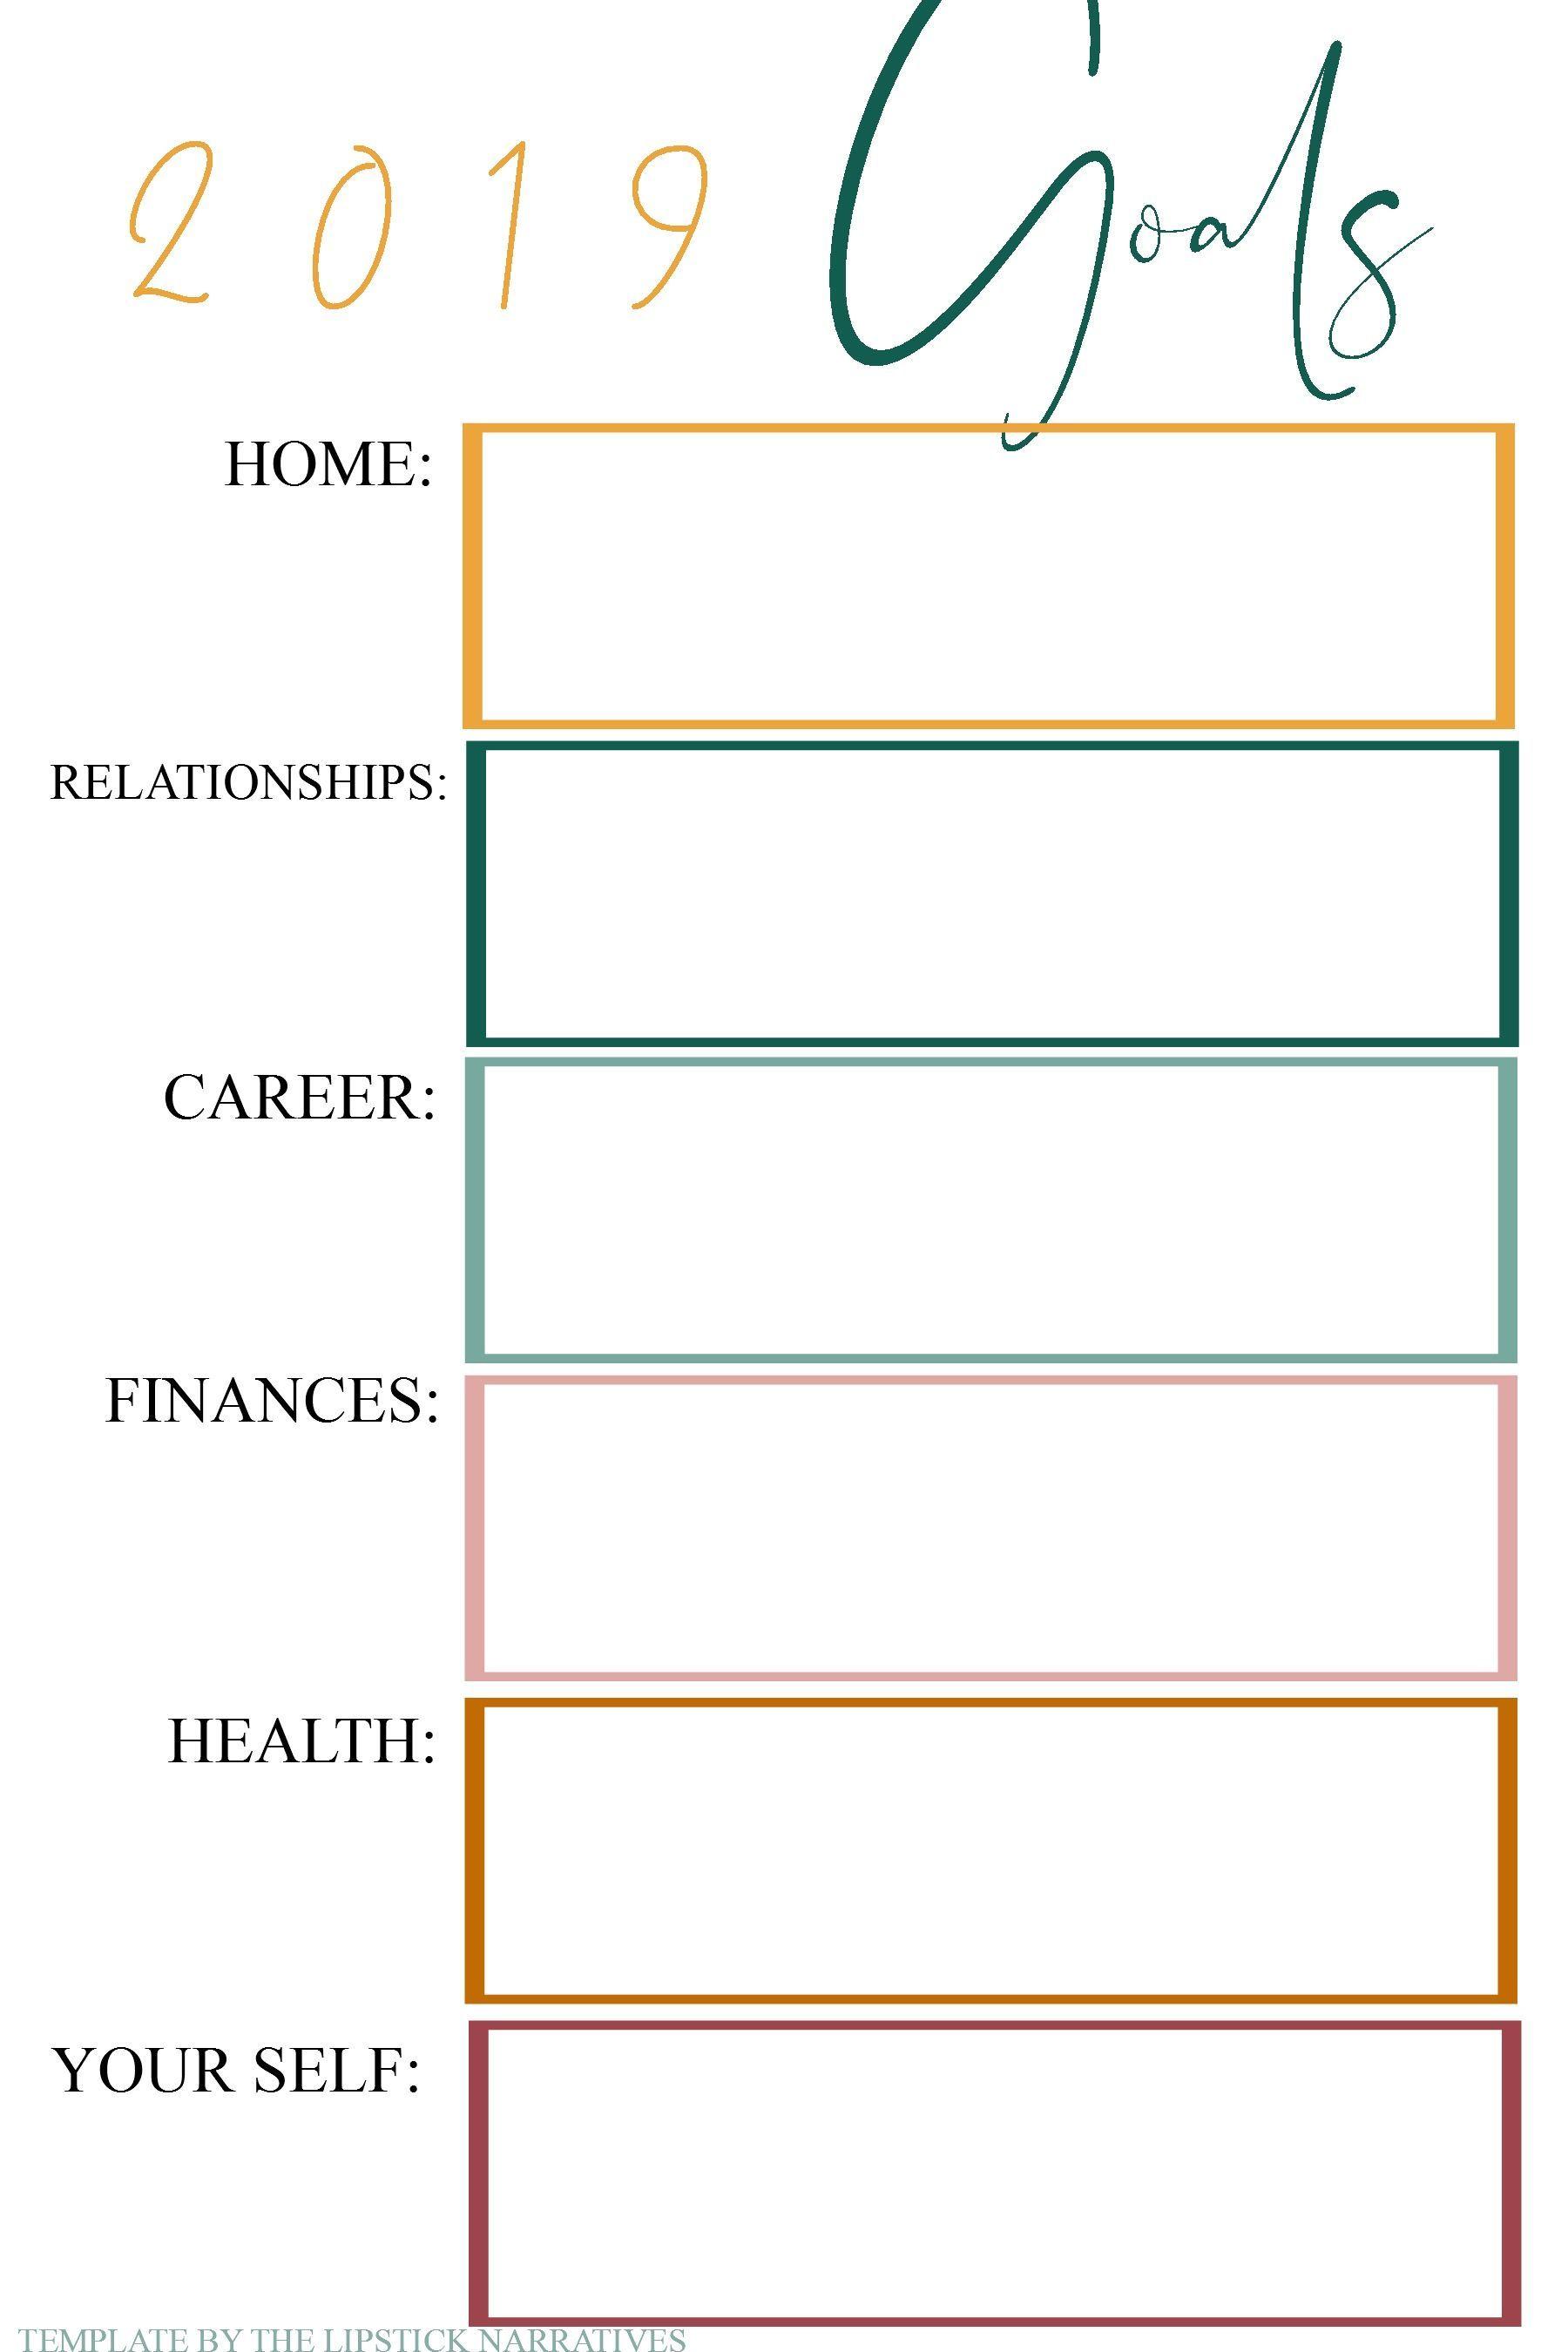 Couples Goal Setting Setting Life Goals Goal Setting Worksheet Life Plan Template Goals Worksheet Life Goals List